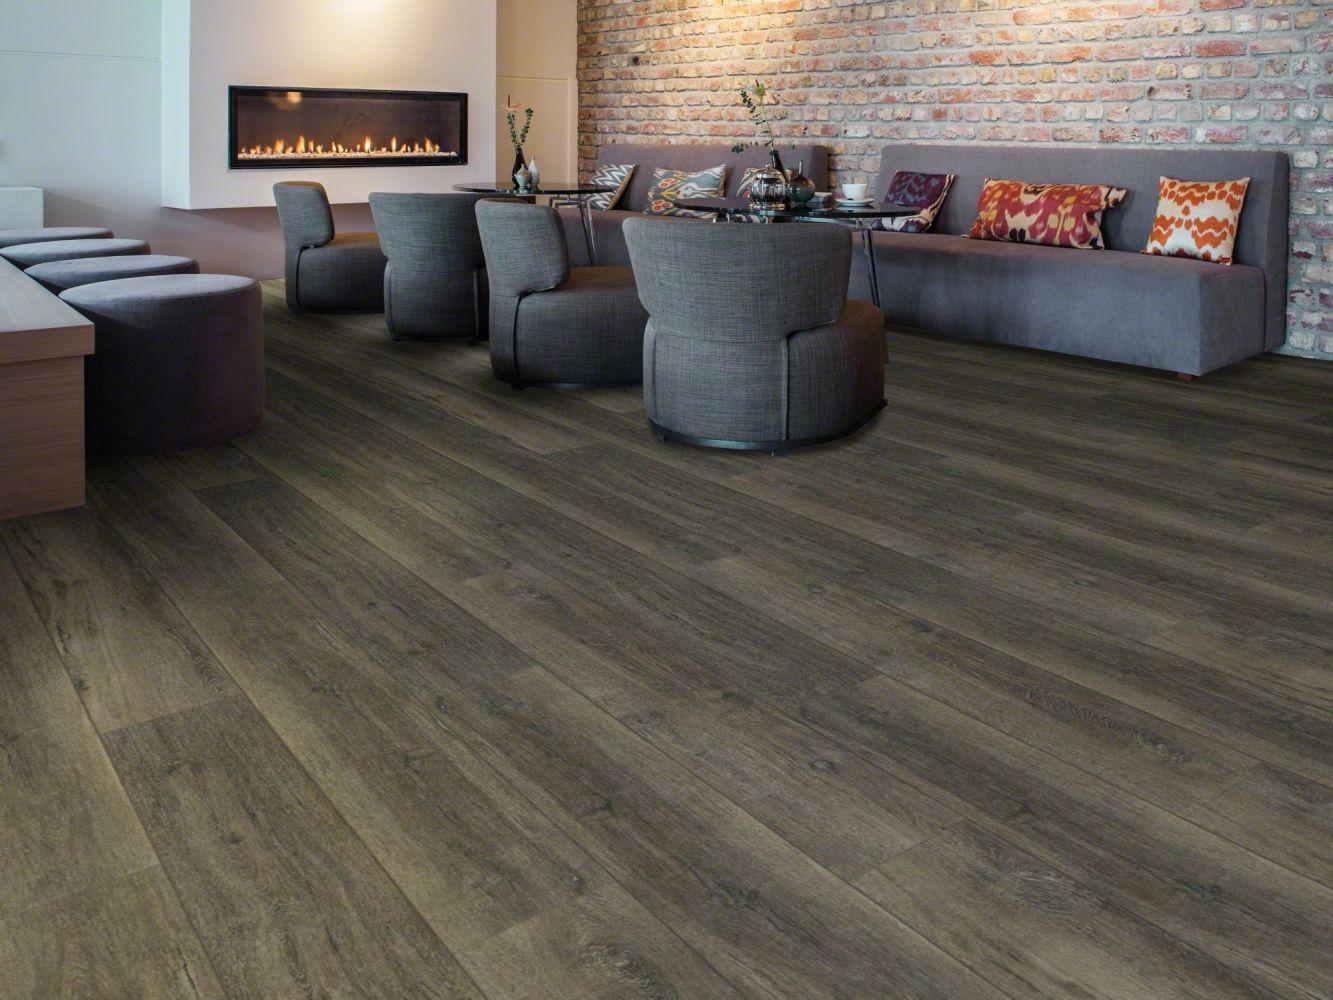 Shaw Floors Nfa HS Beaver Creek Bur Oak 00742_VH544